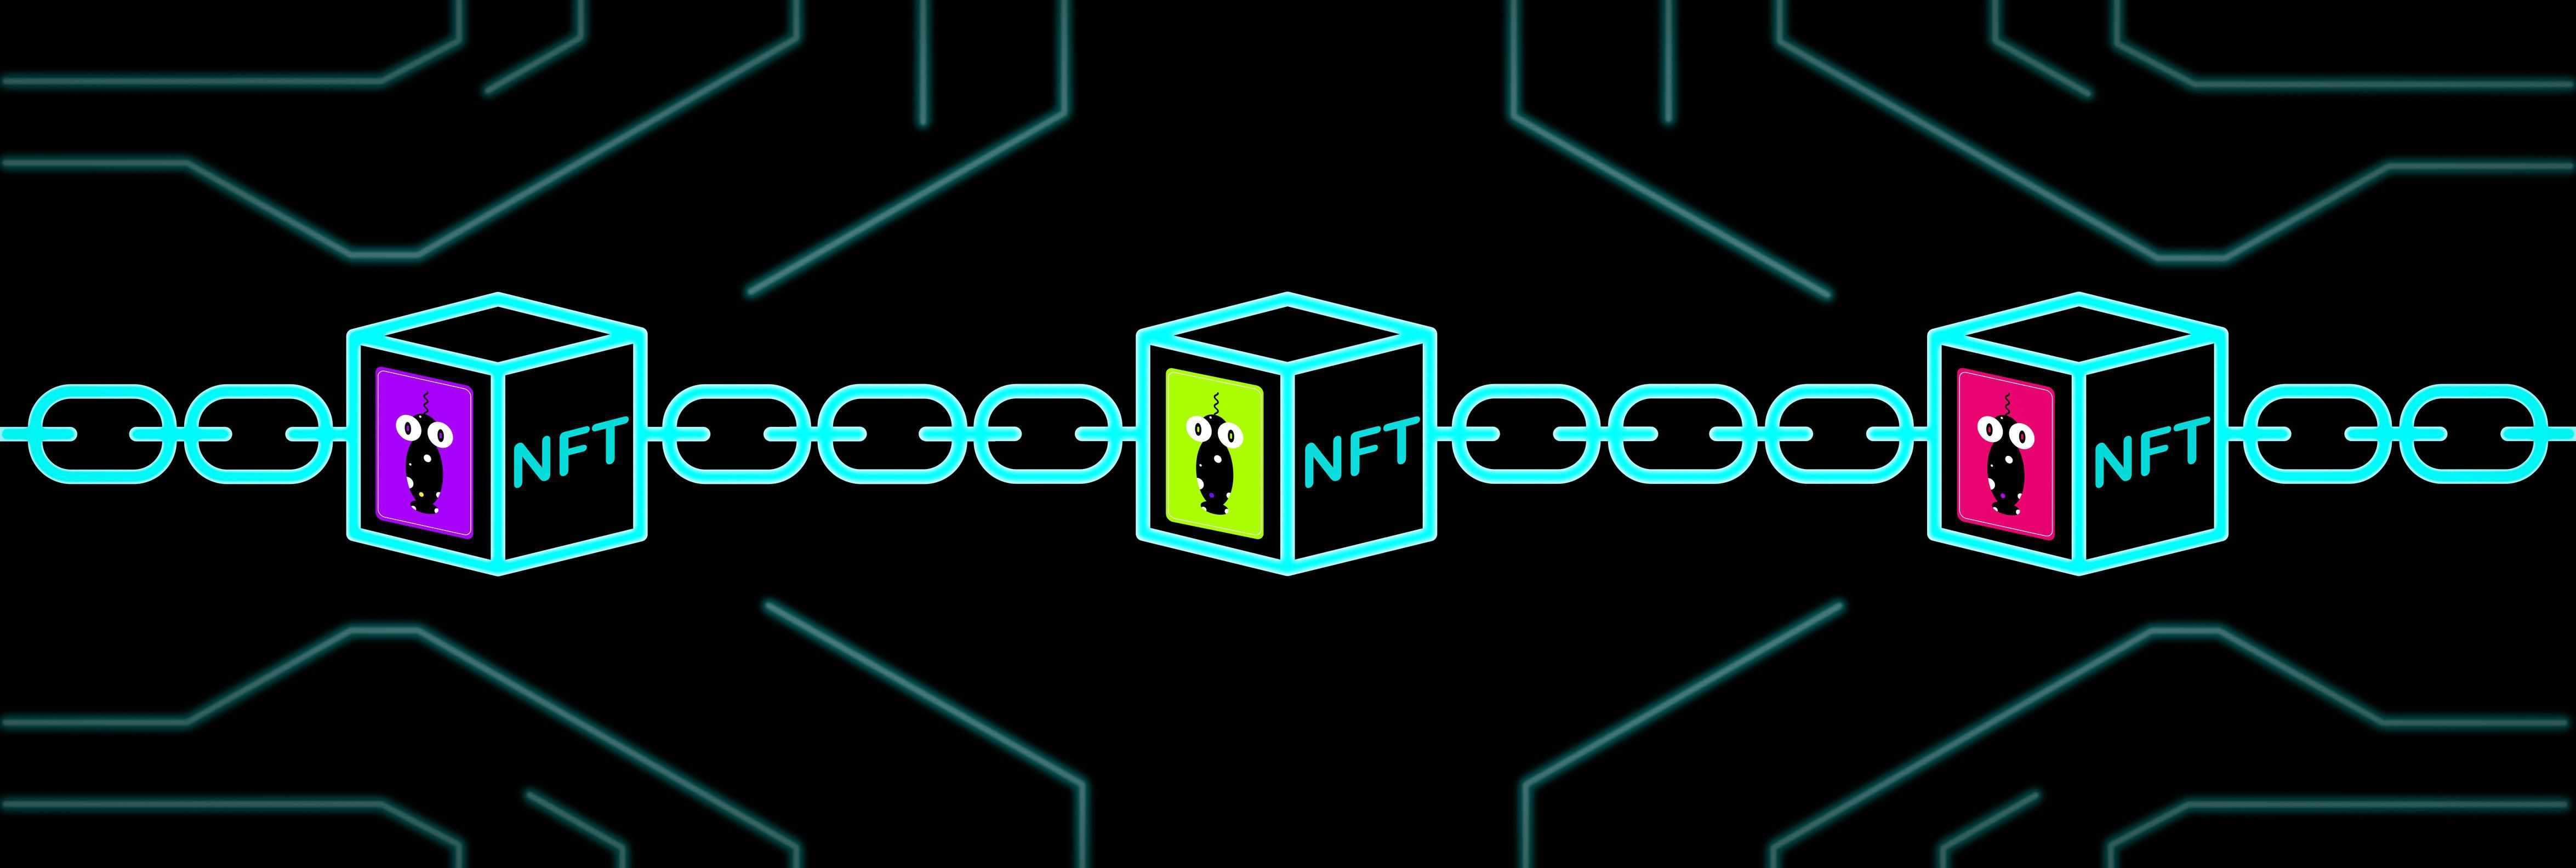 blockchain sufficiently technology tech nfts